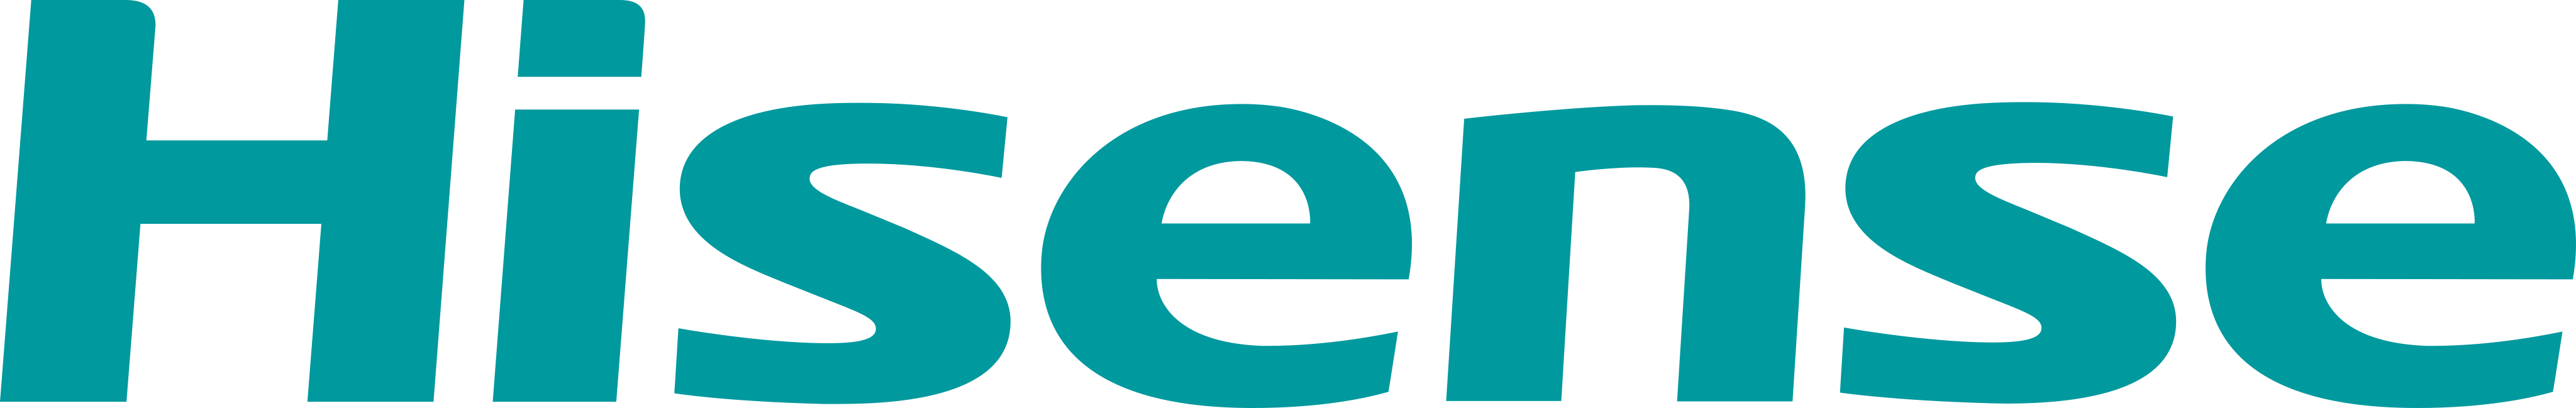 hisense logo - Hisense Logo